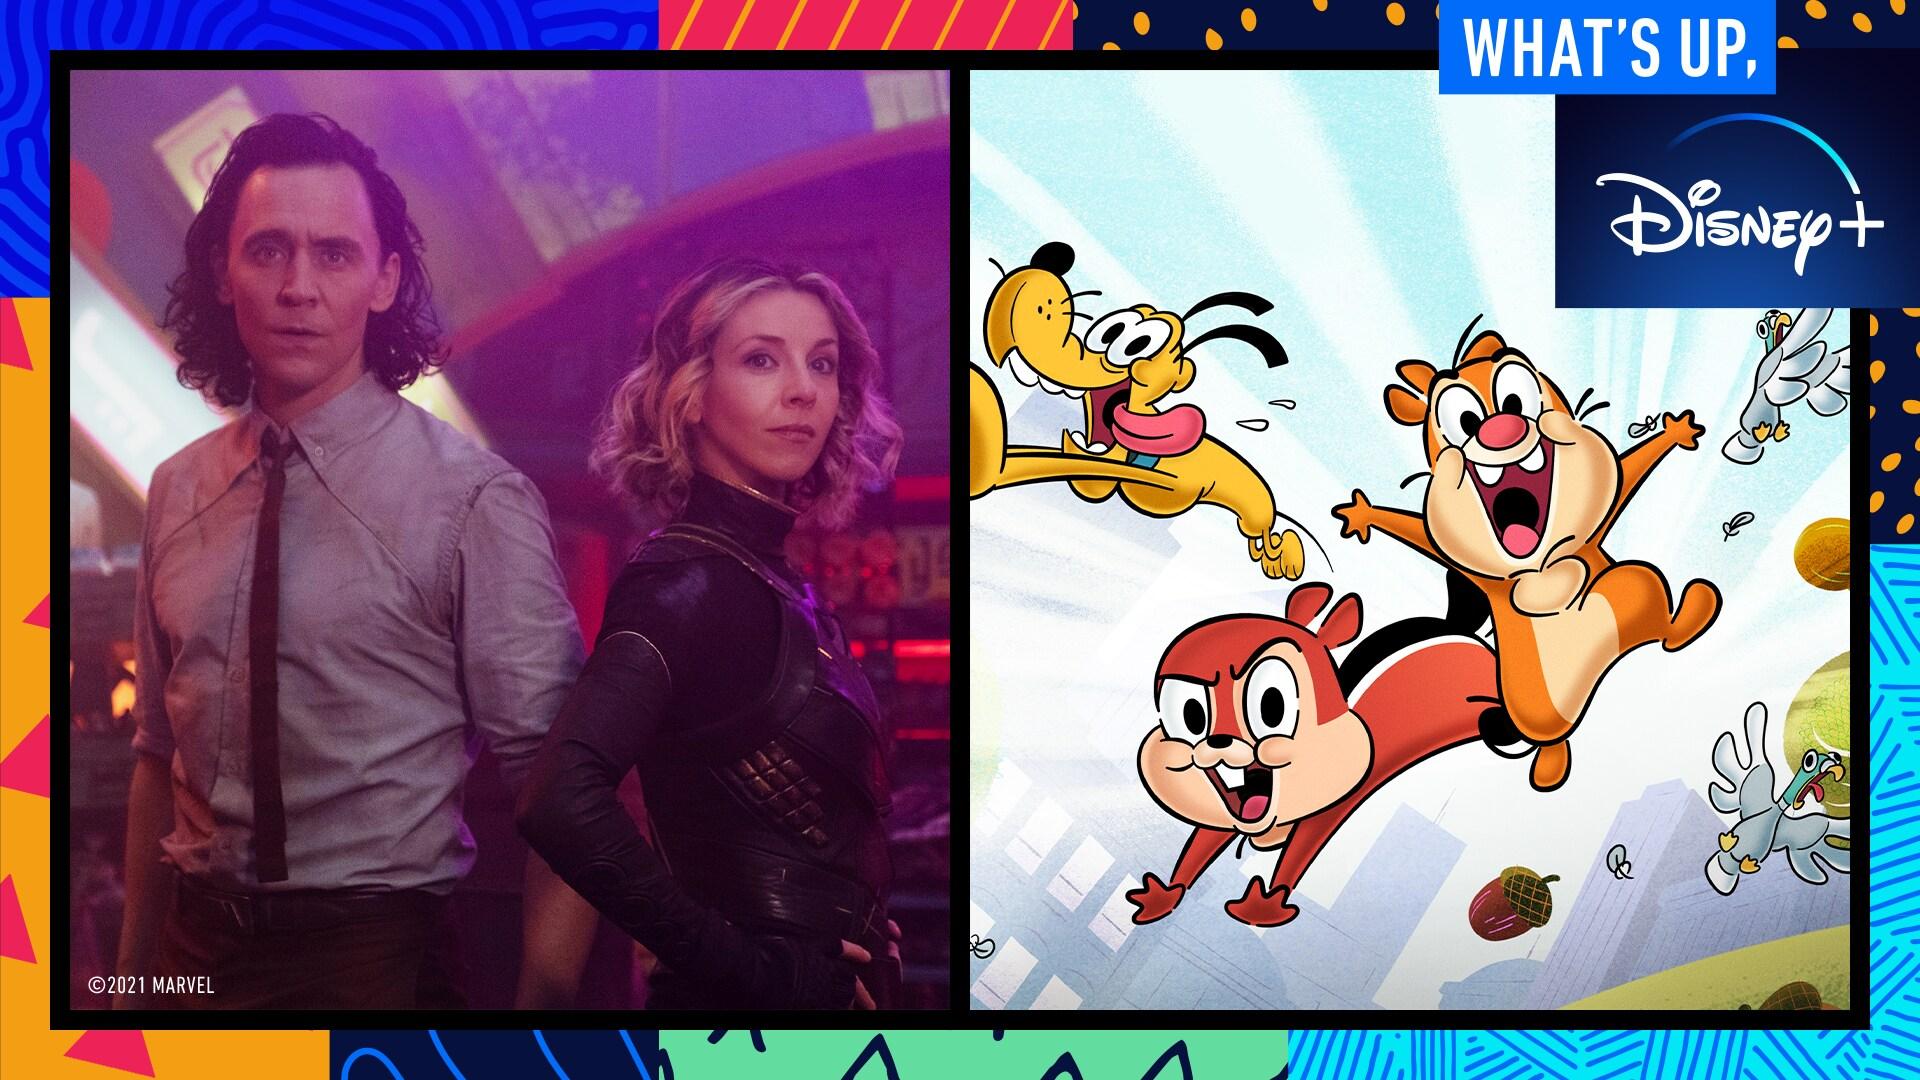 Chip 'n' Dale: Park Life Trivia and Marvel Studios' Loki Director Kate Herron | What's Up, Disney+